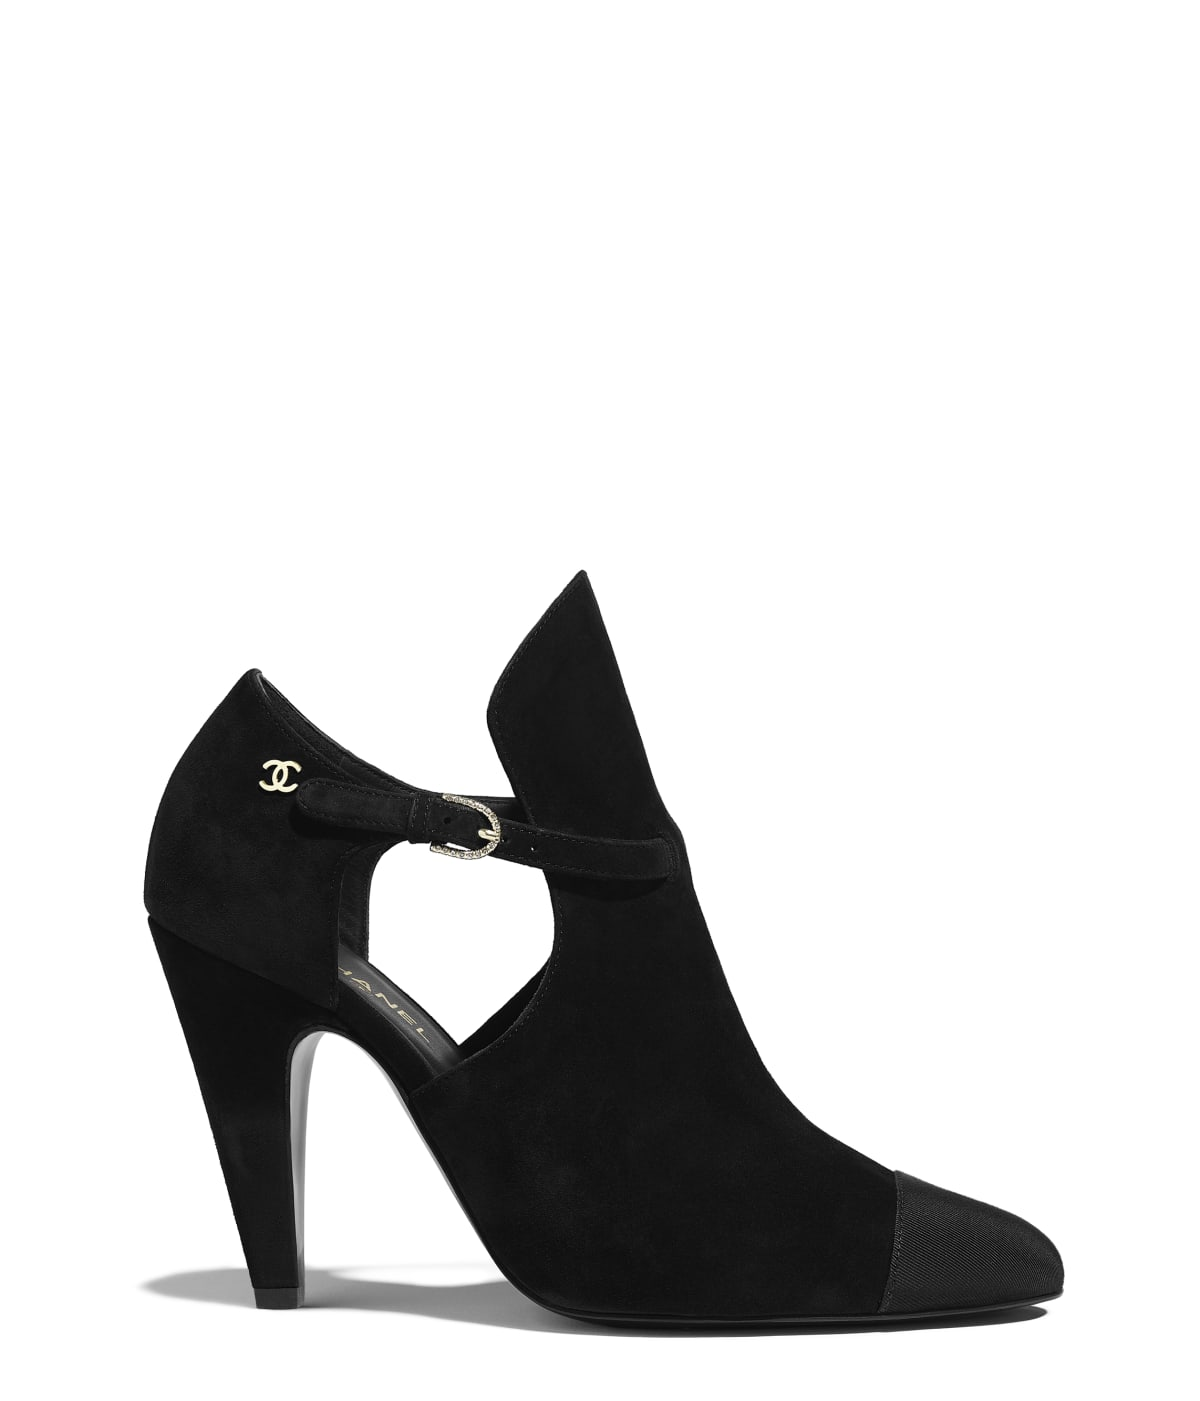 Ankle Boots, suede calfskin \u0026 grosgrain